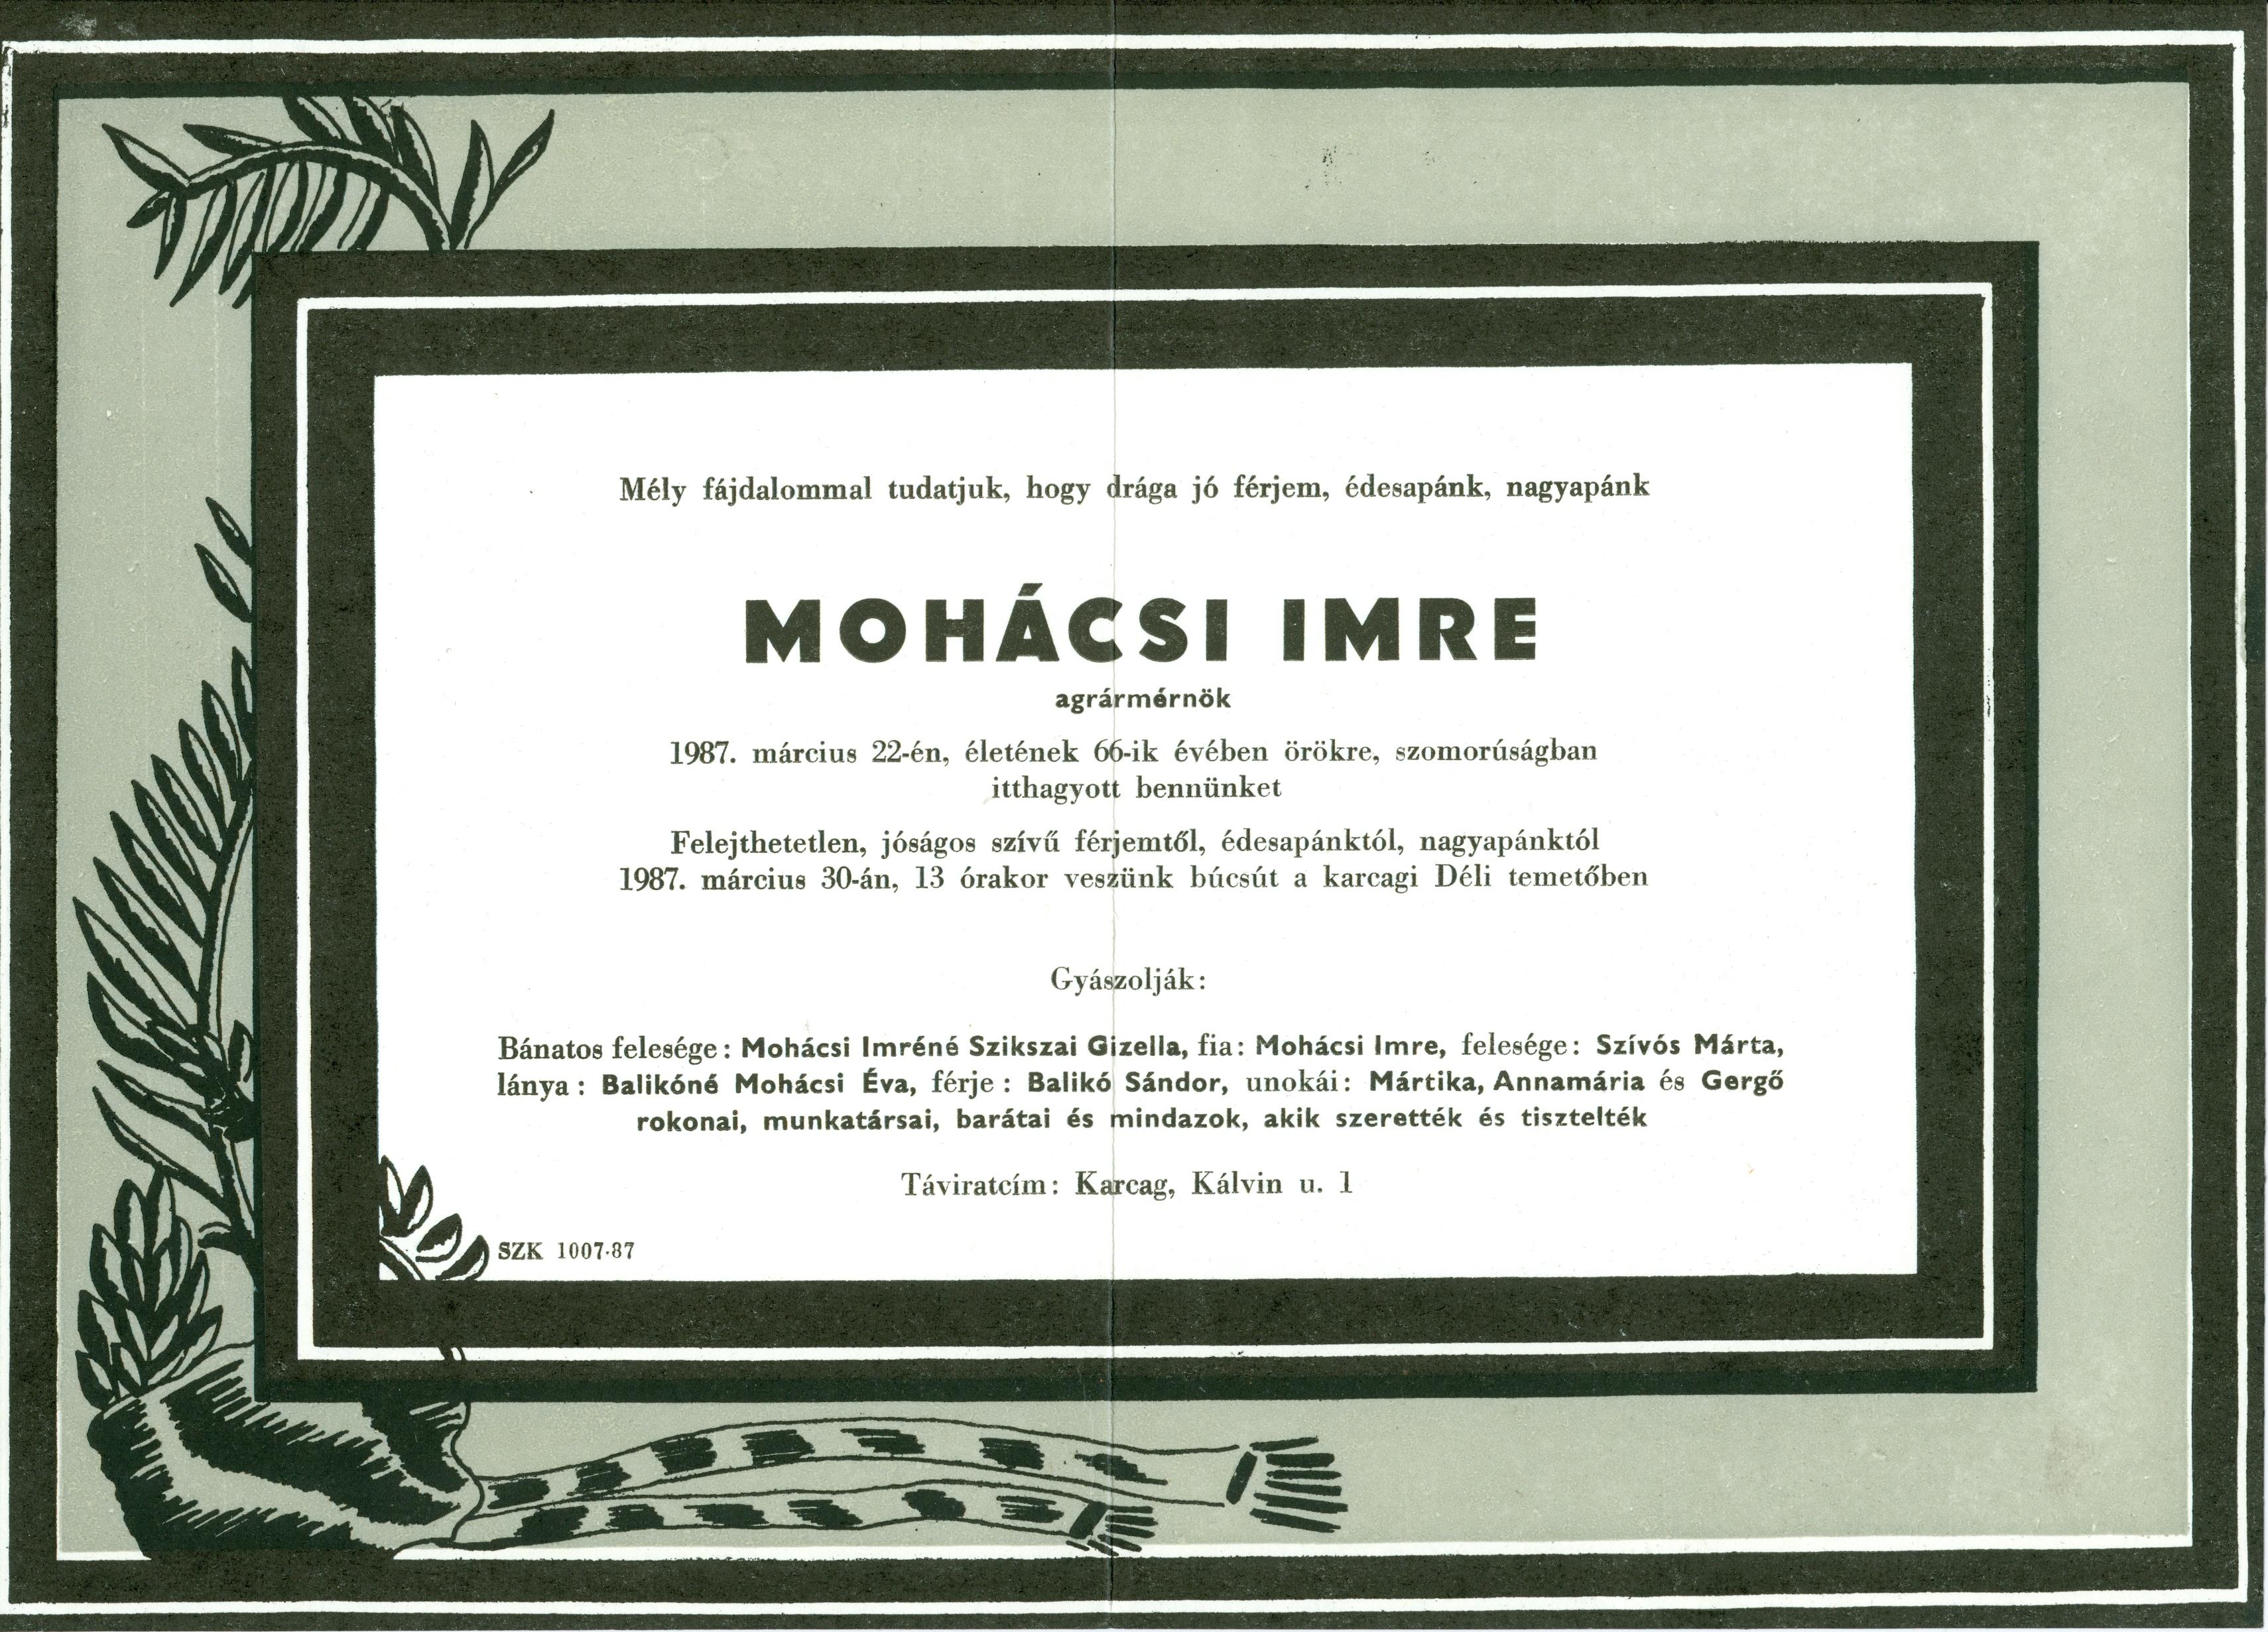 Mohácsi Imre